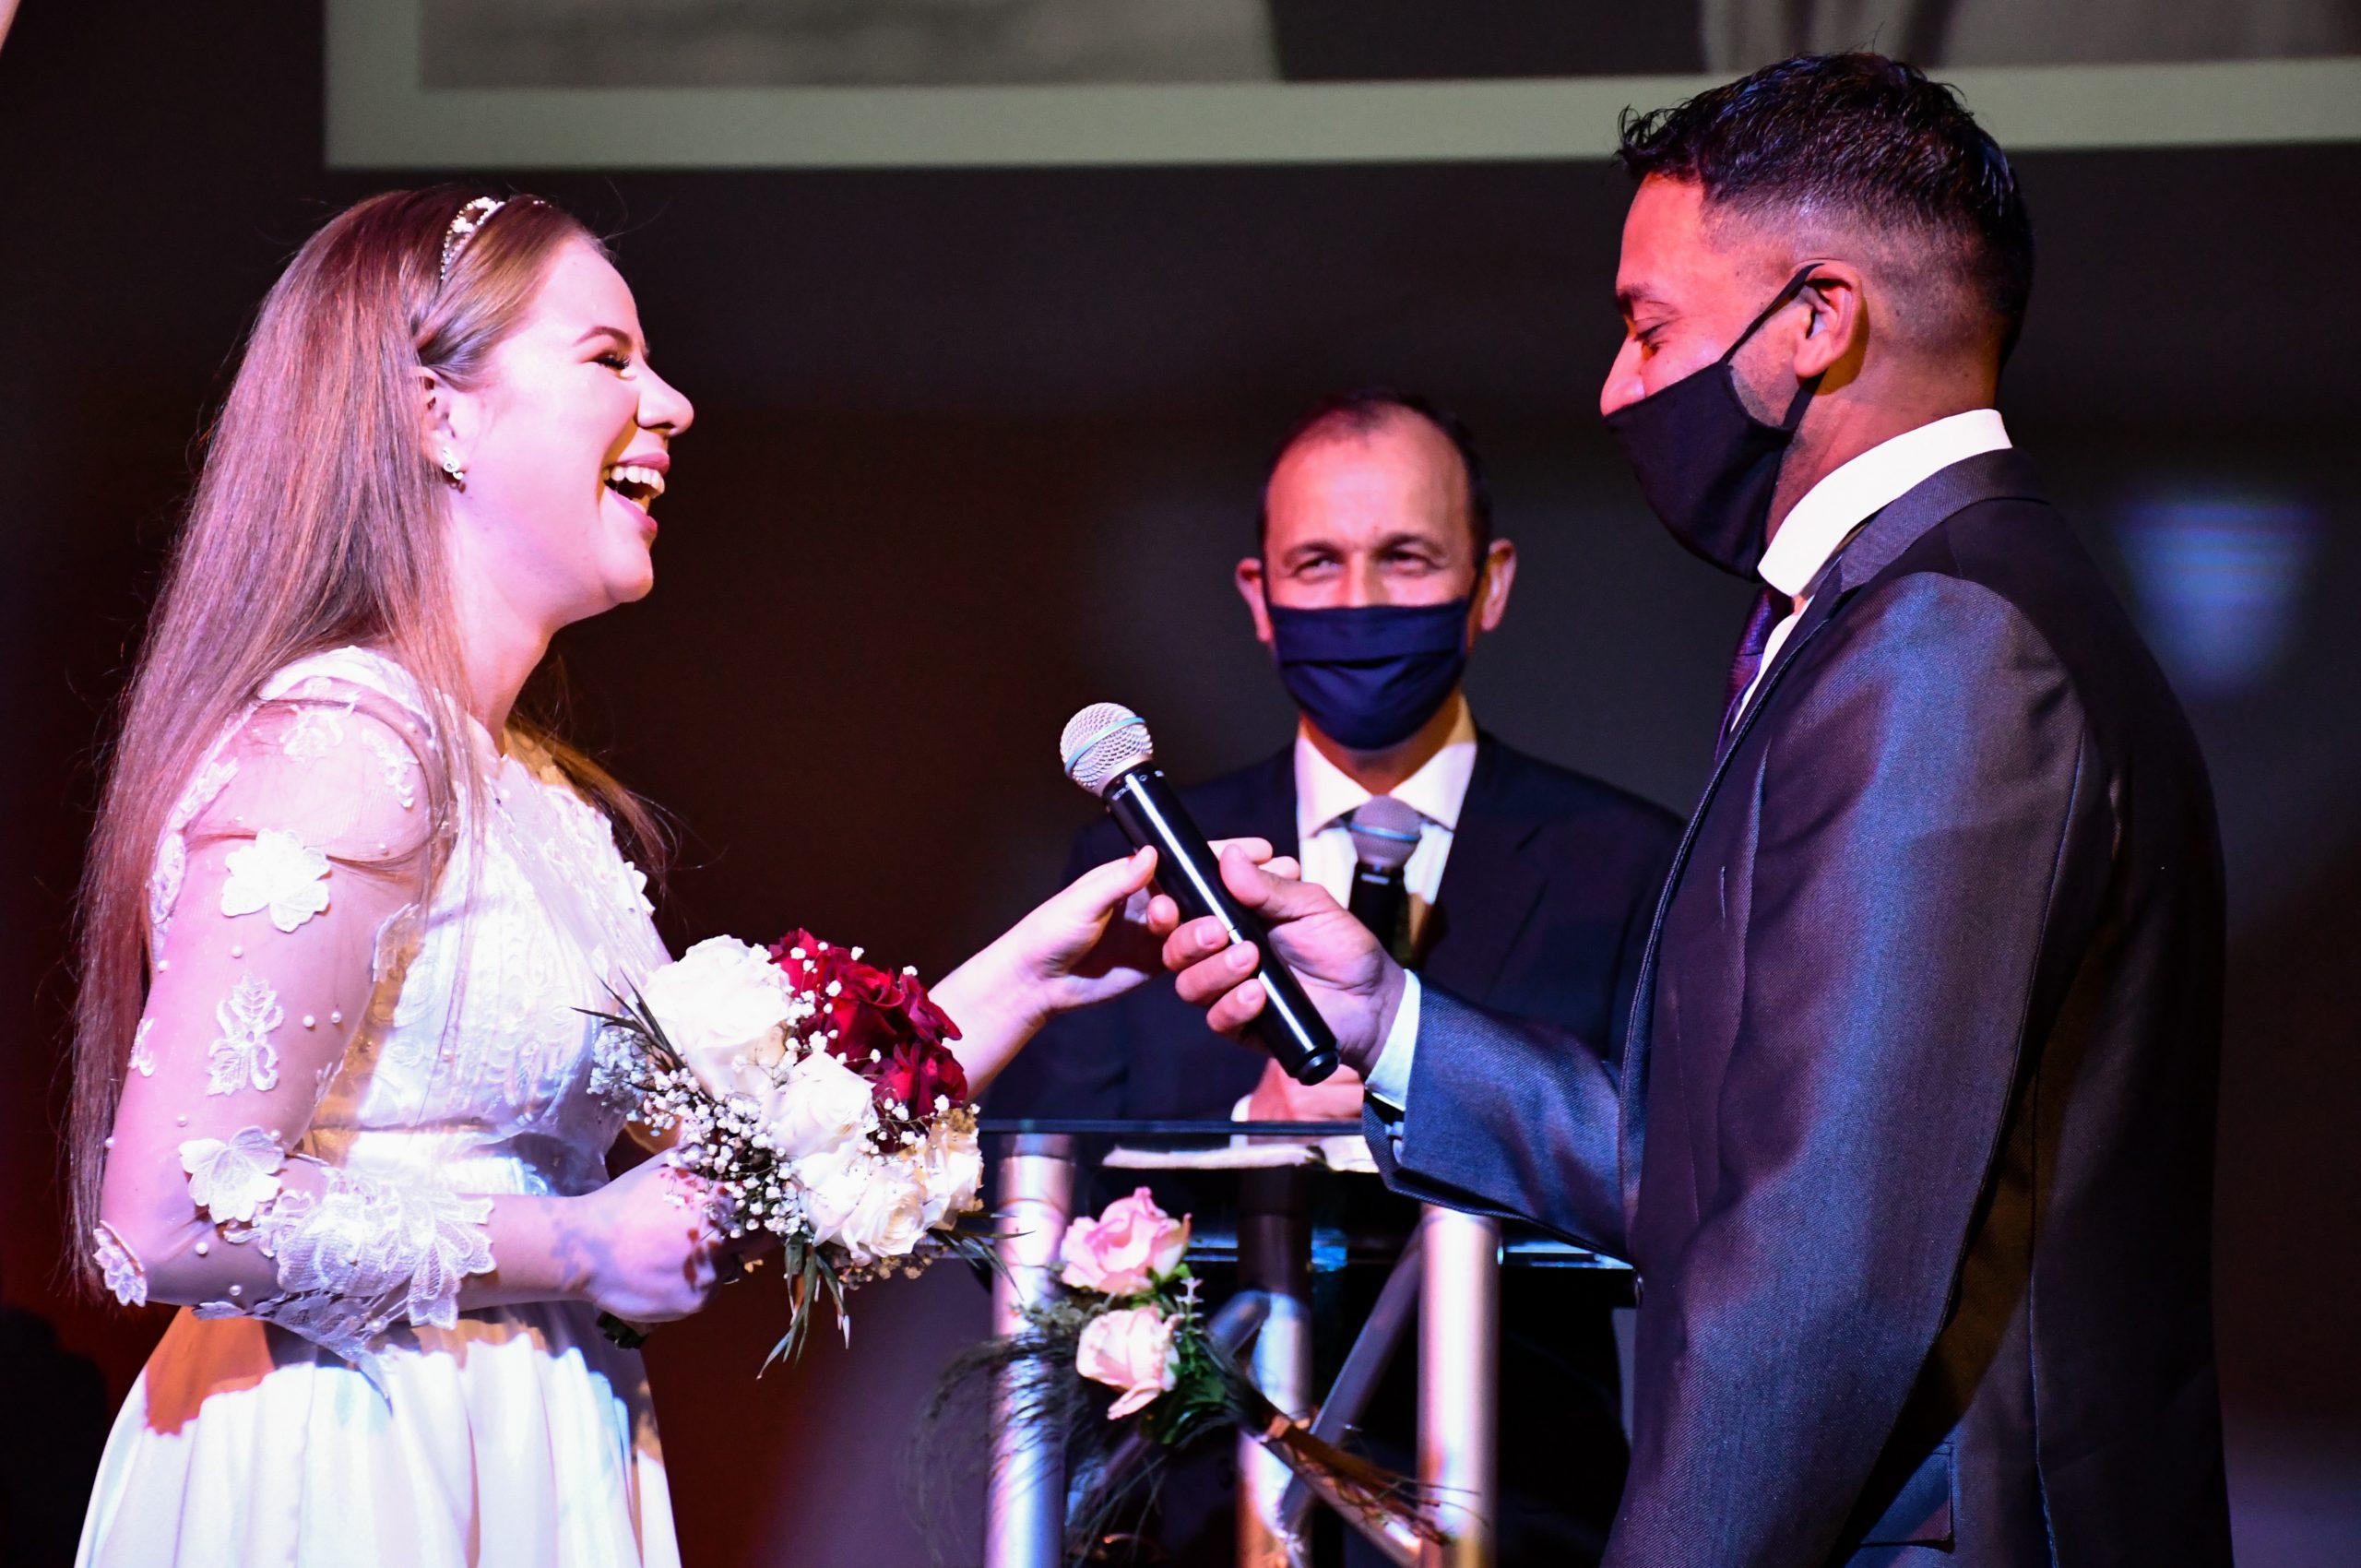 dahiana waszaj mYSP8kdlhp0 unsplash scaled Here Are The Cringiest Wedding Moments Ever Arranged By The Happy Couple Copy